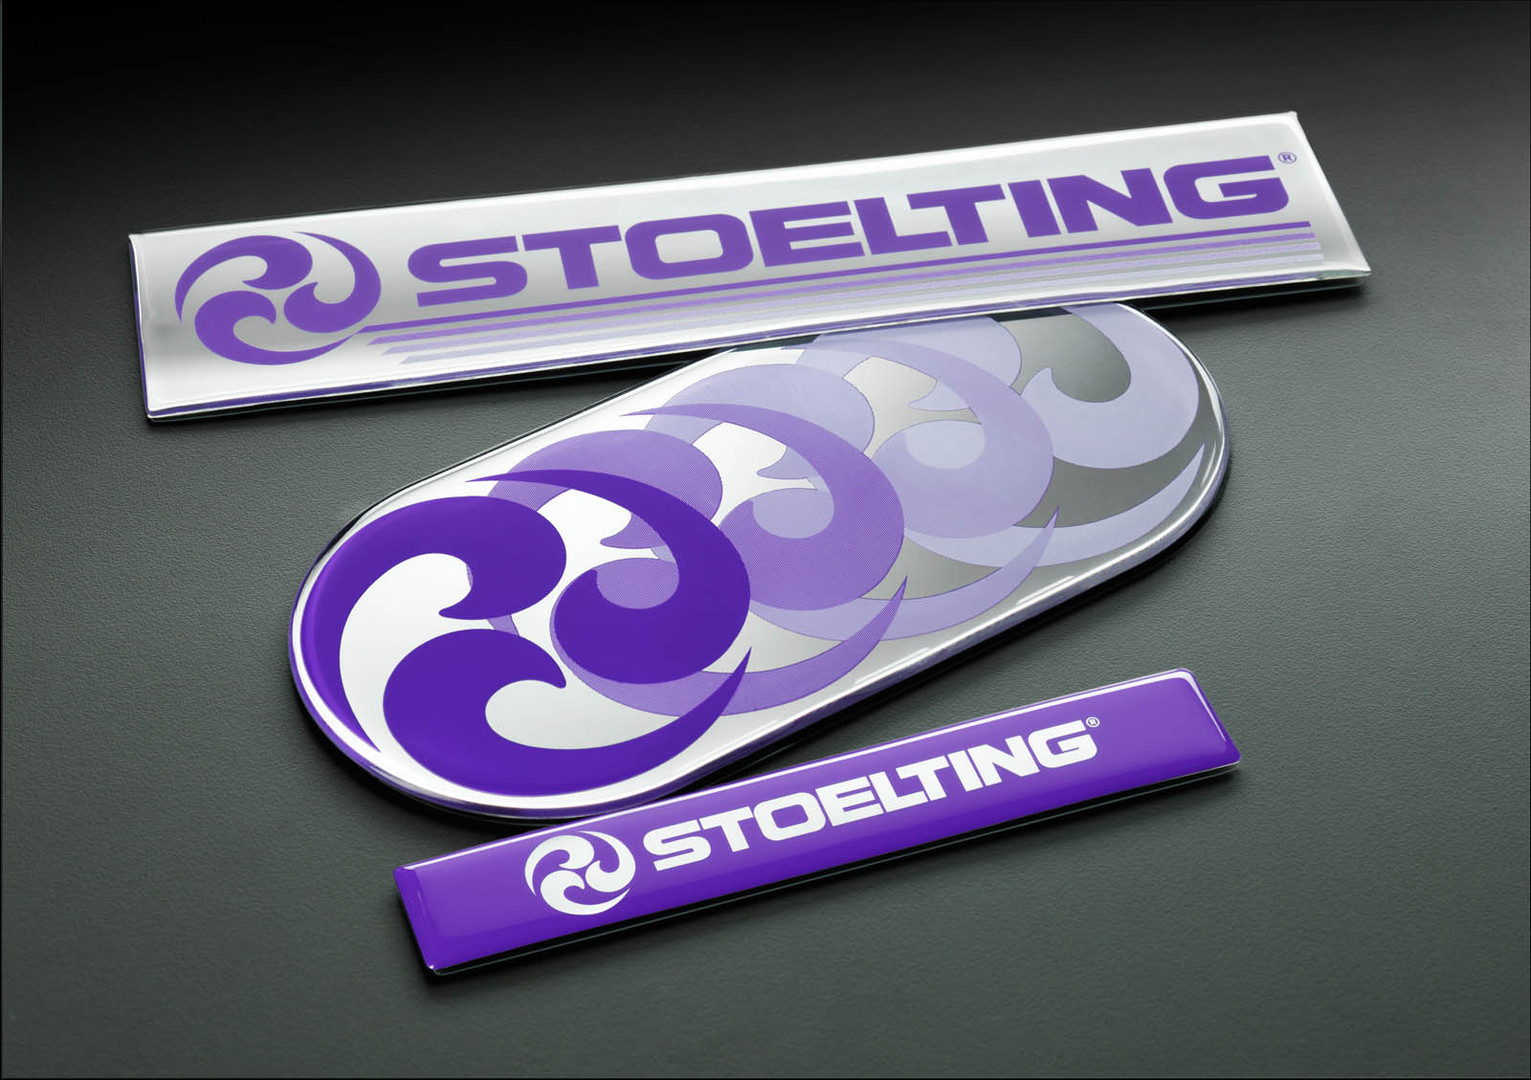 Stoelting Labels